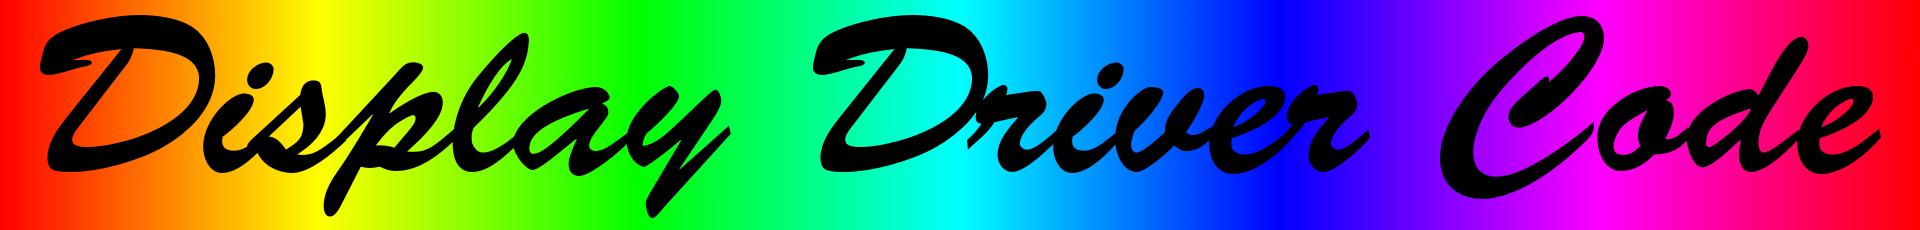 EDDC - Enhanced Display Driver Code